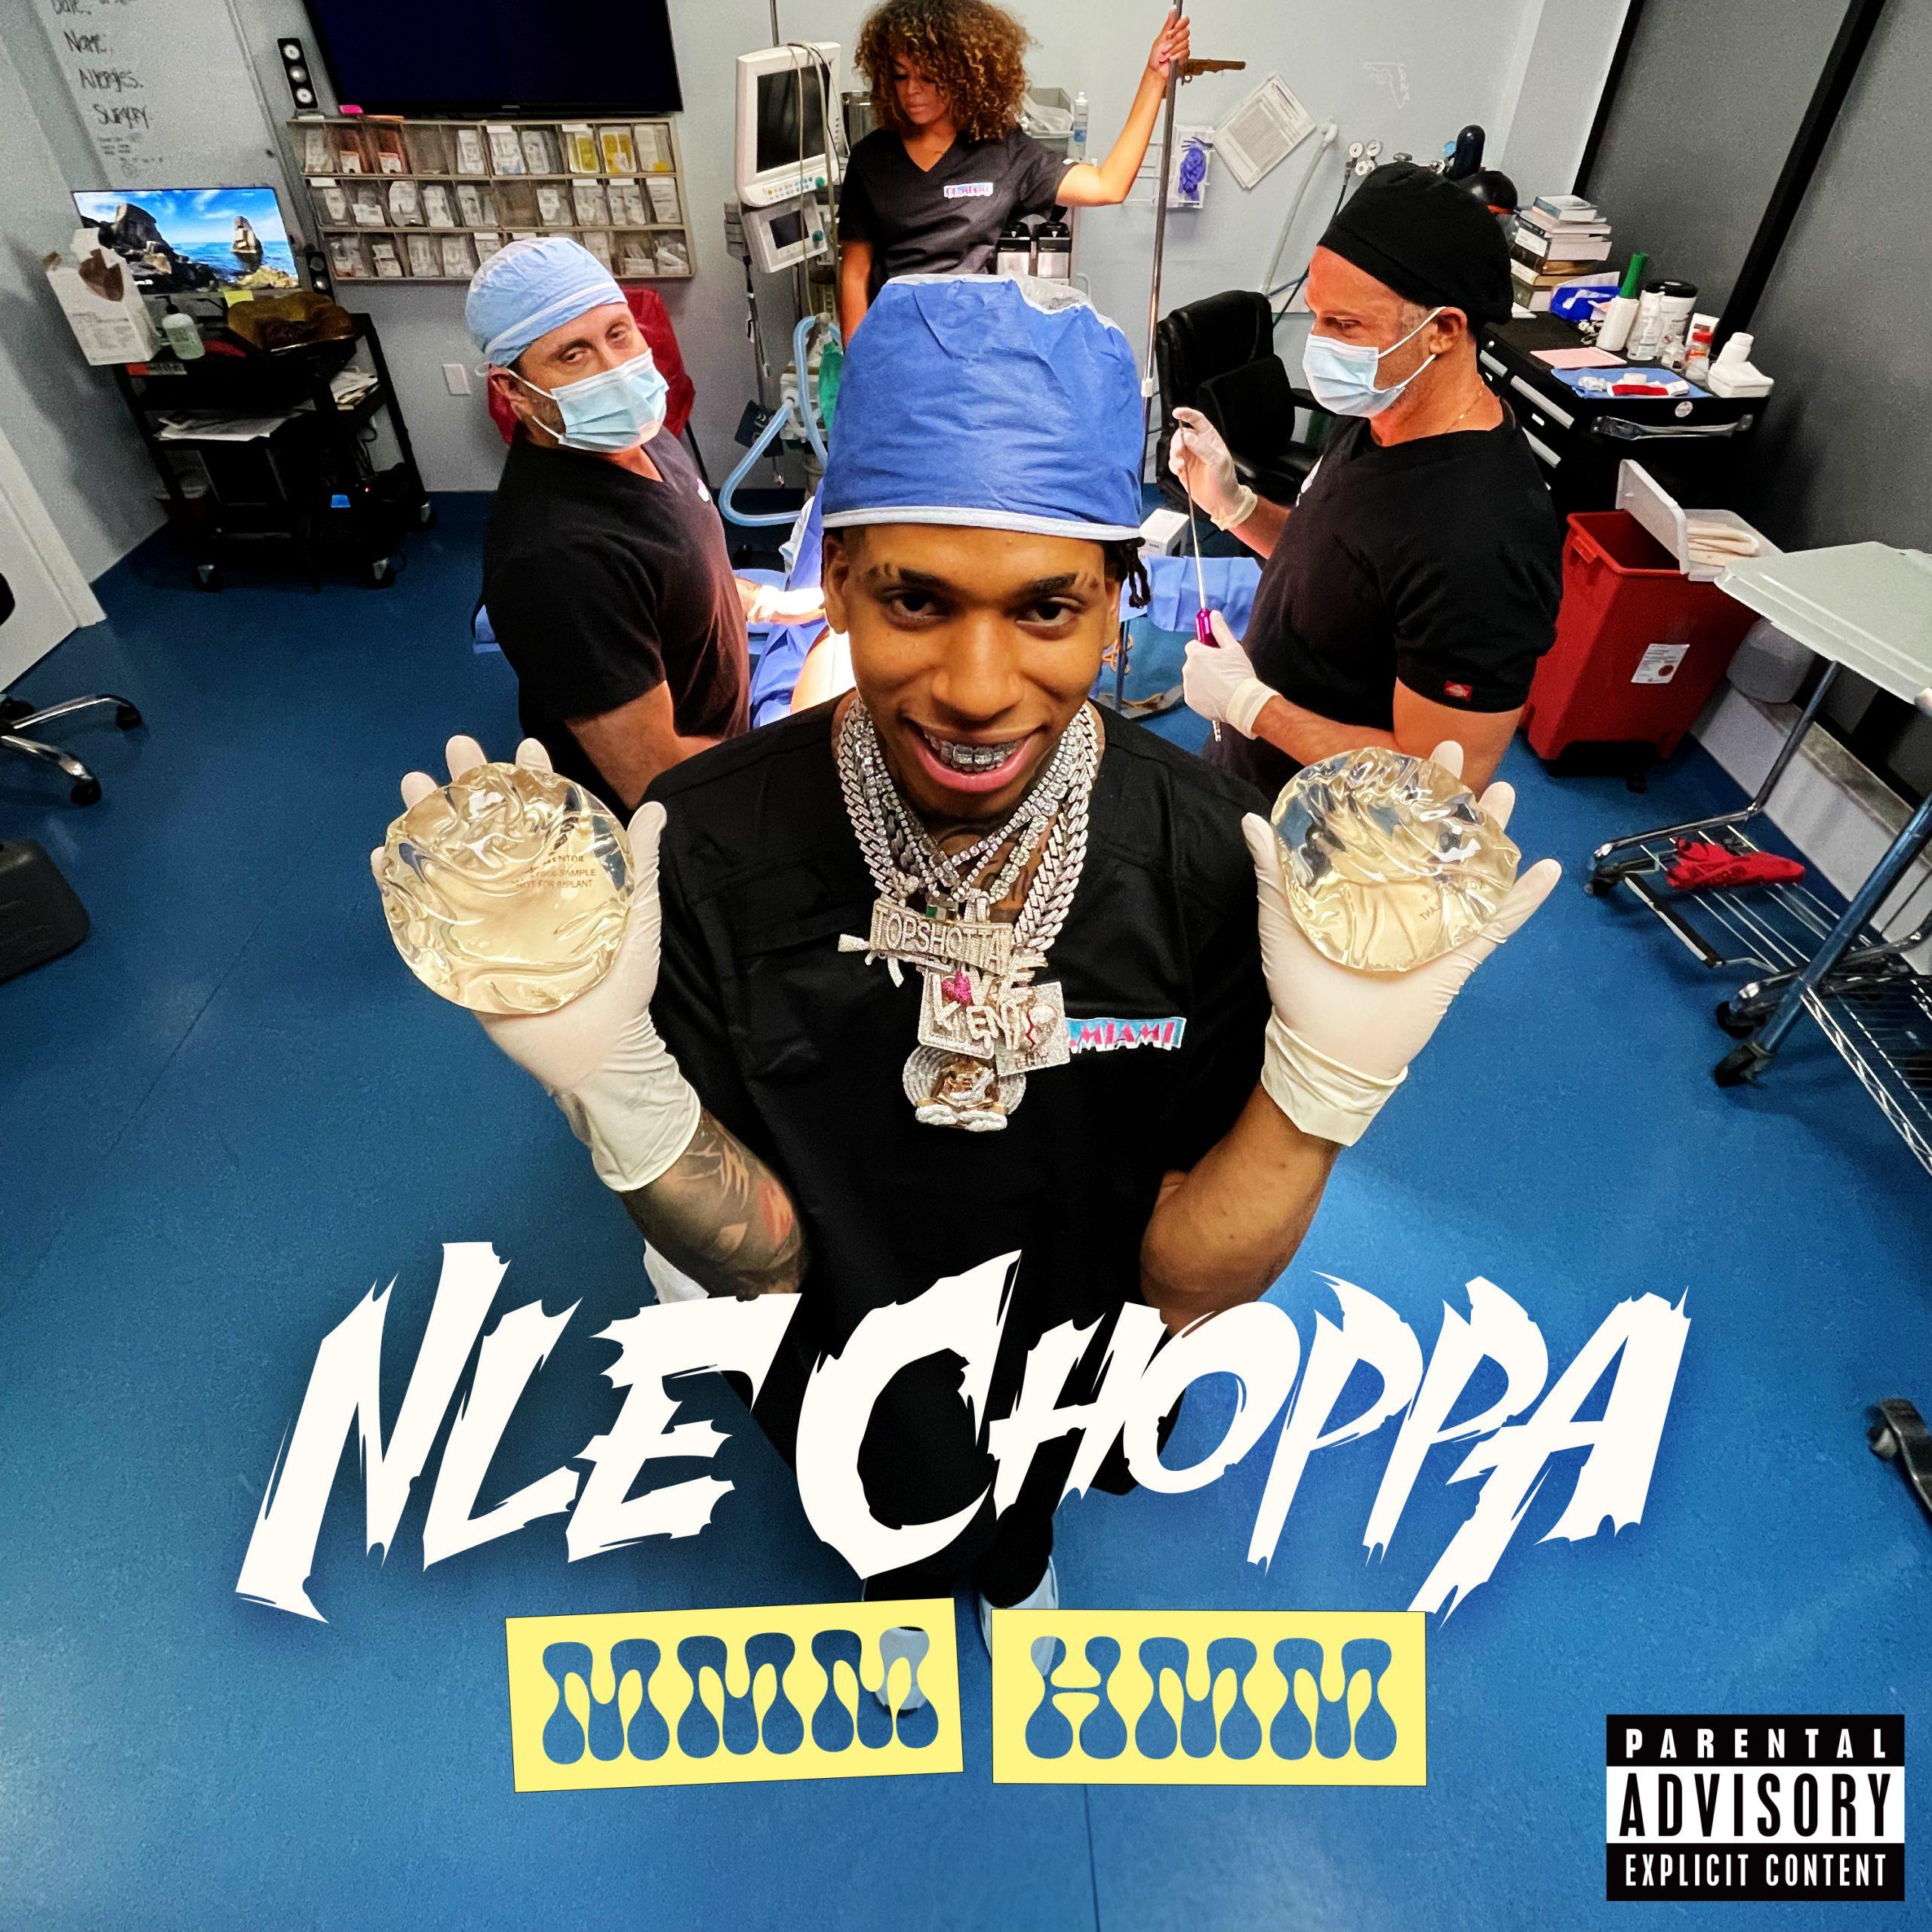 [WATCH] NLE Choppa Returns with New Video Mmm Hmm